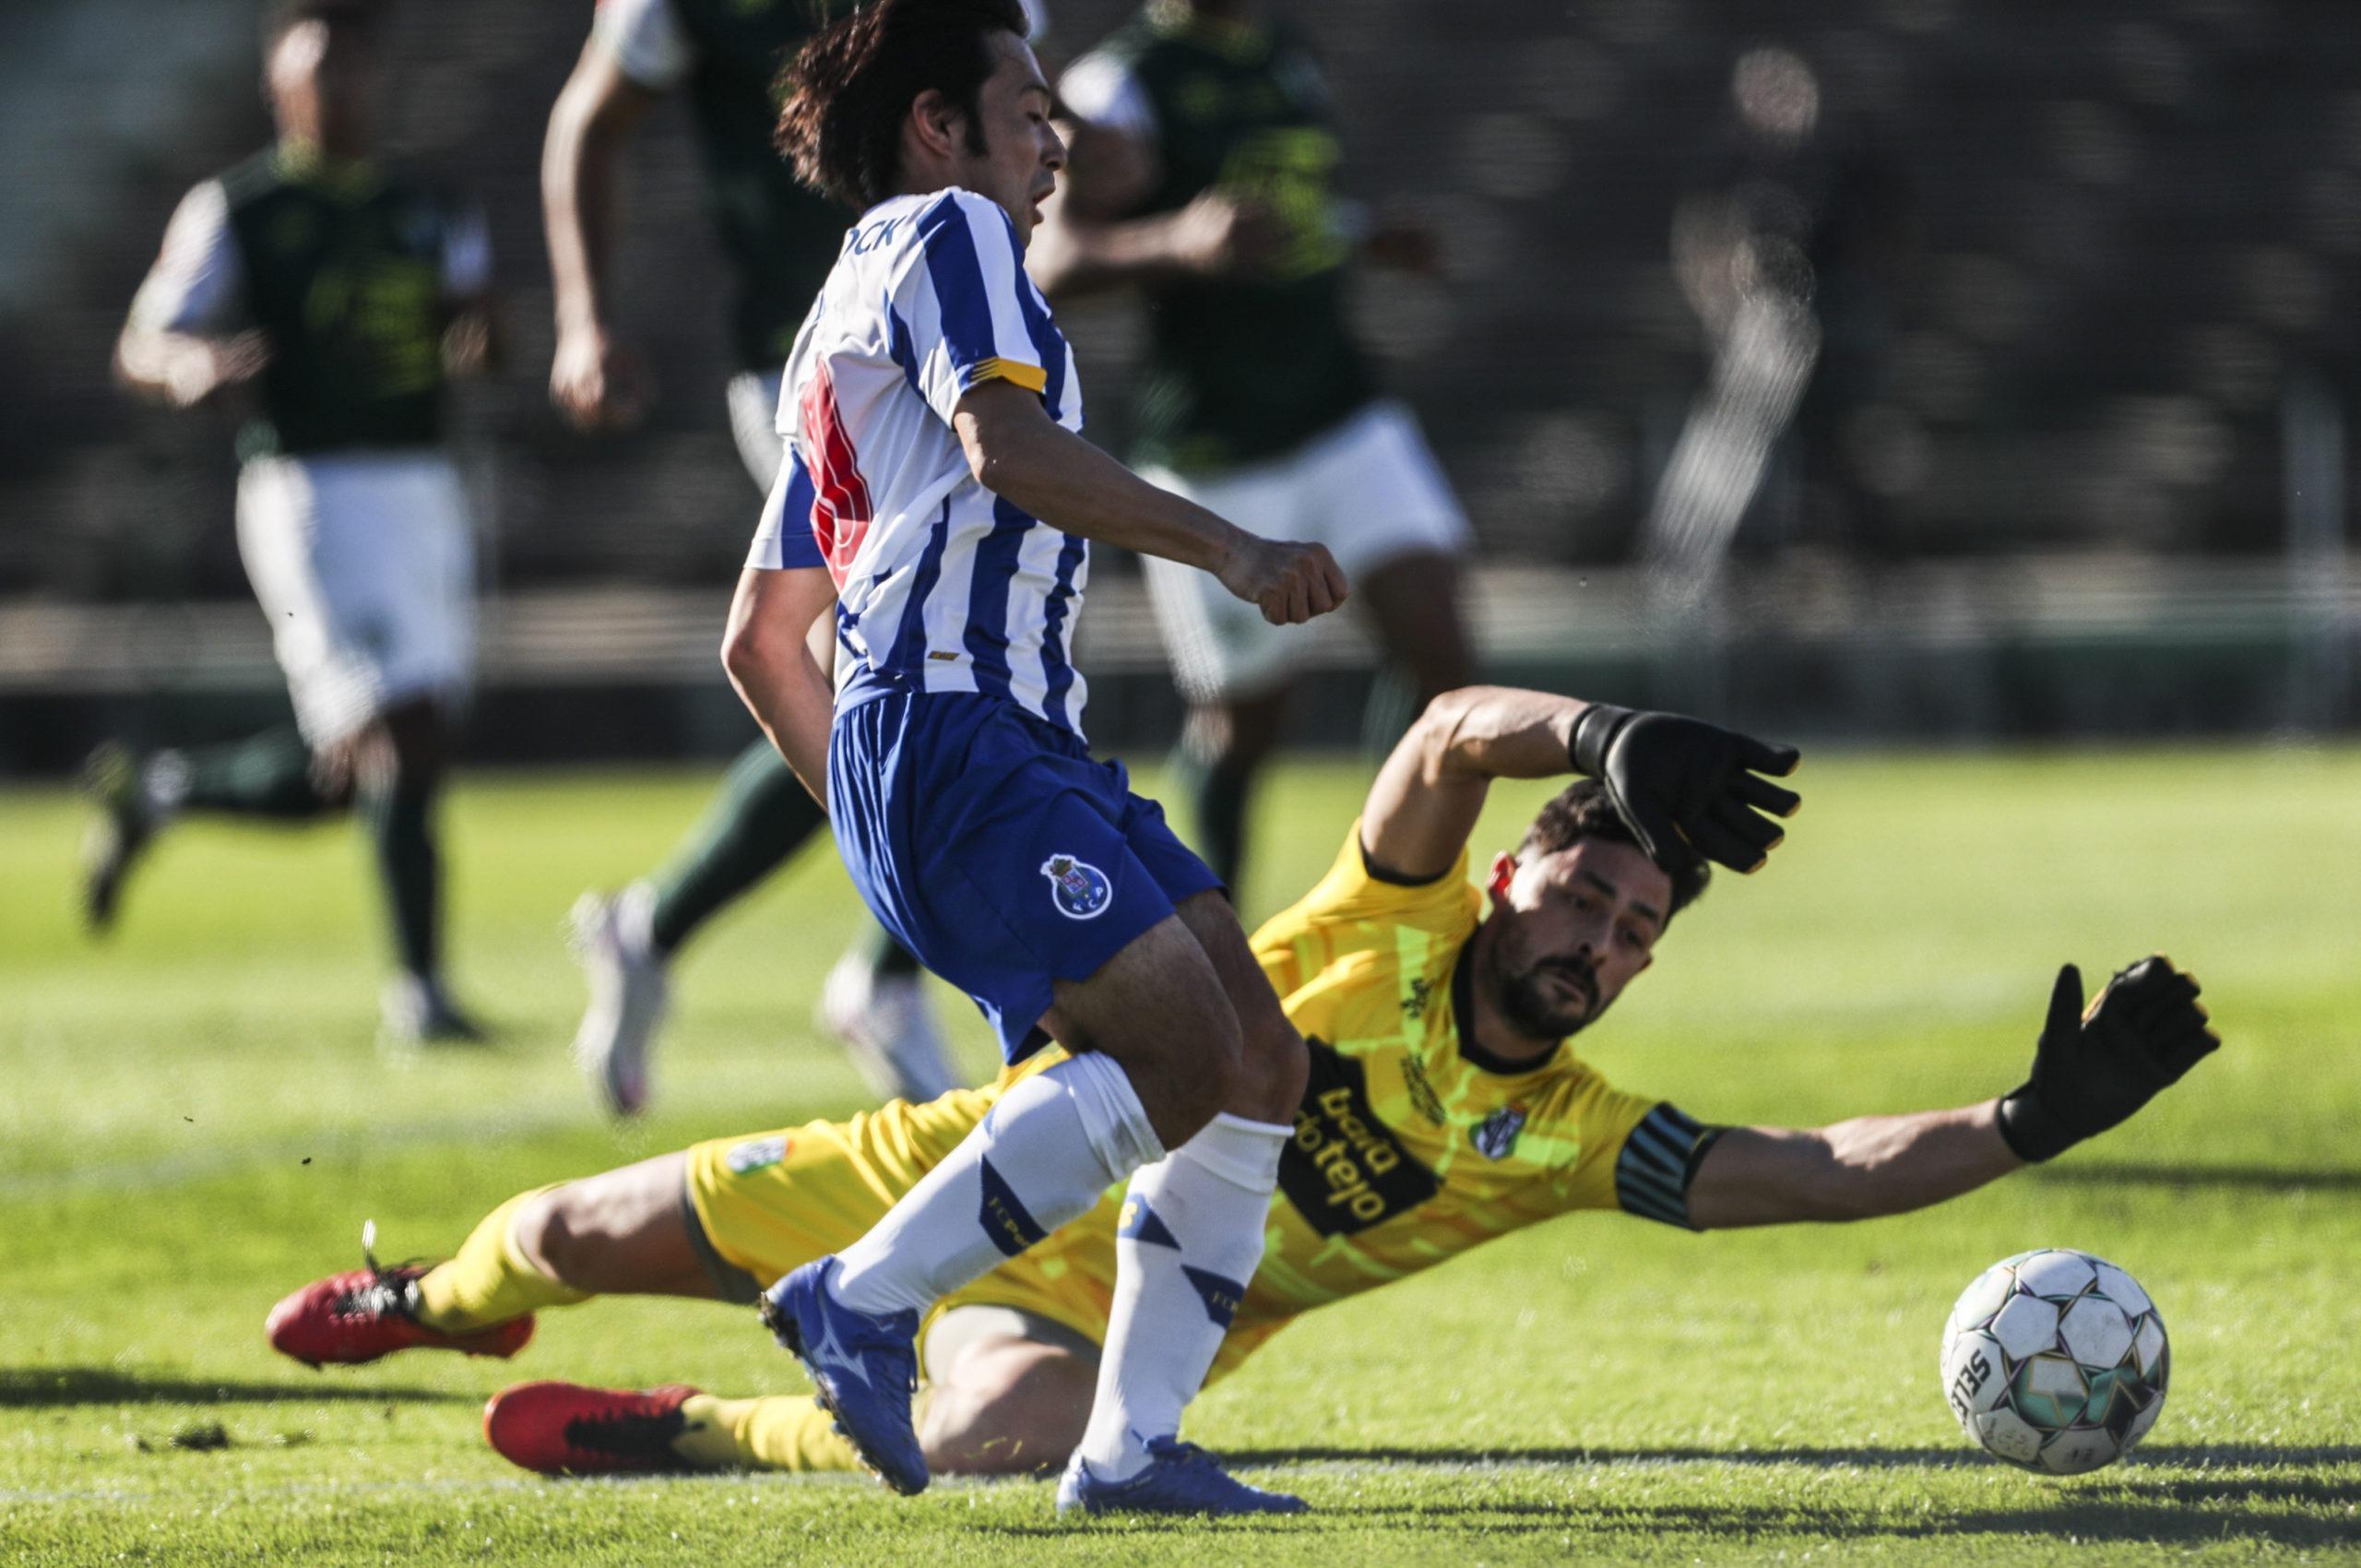 OM - Le FC Porto engrange de la confiance avant l'OM